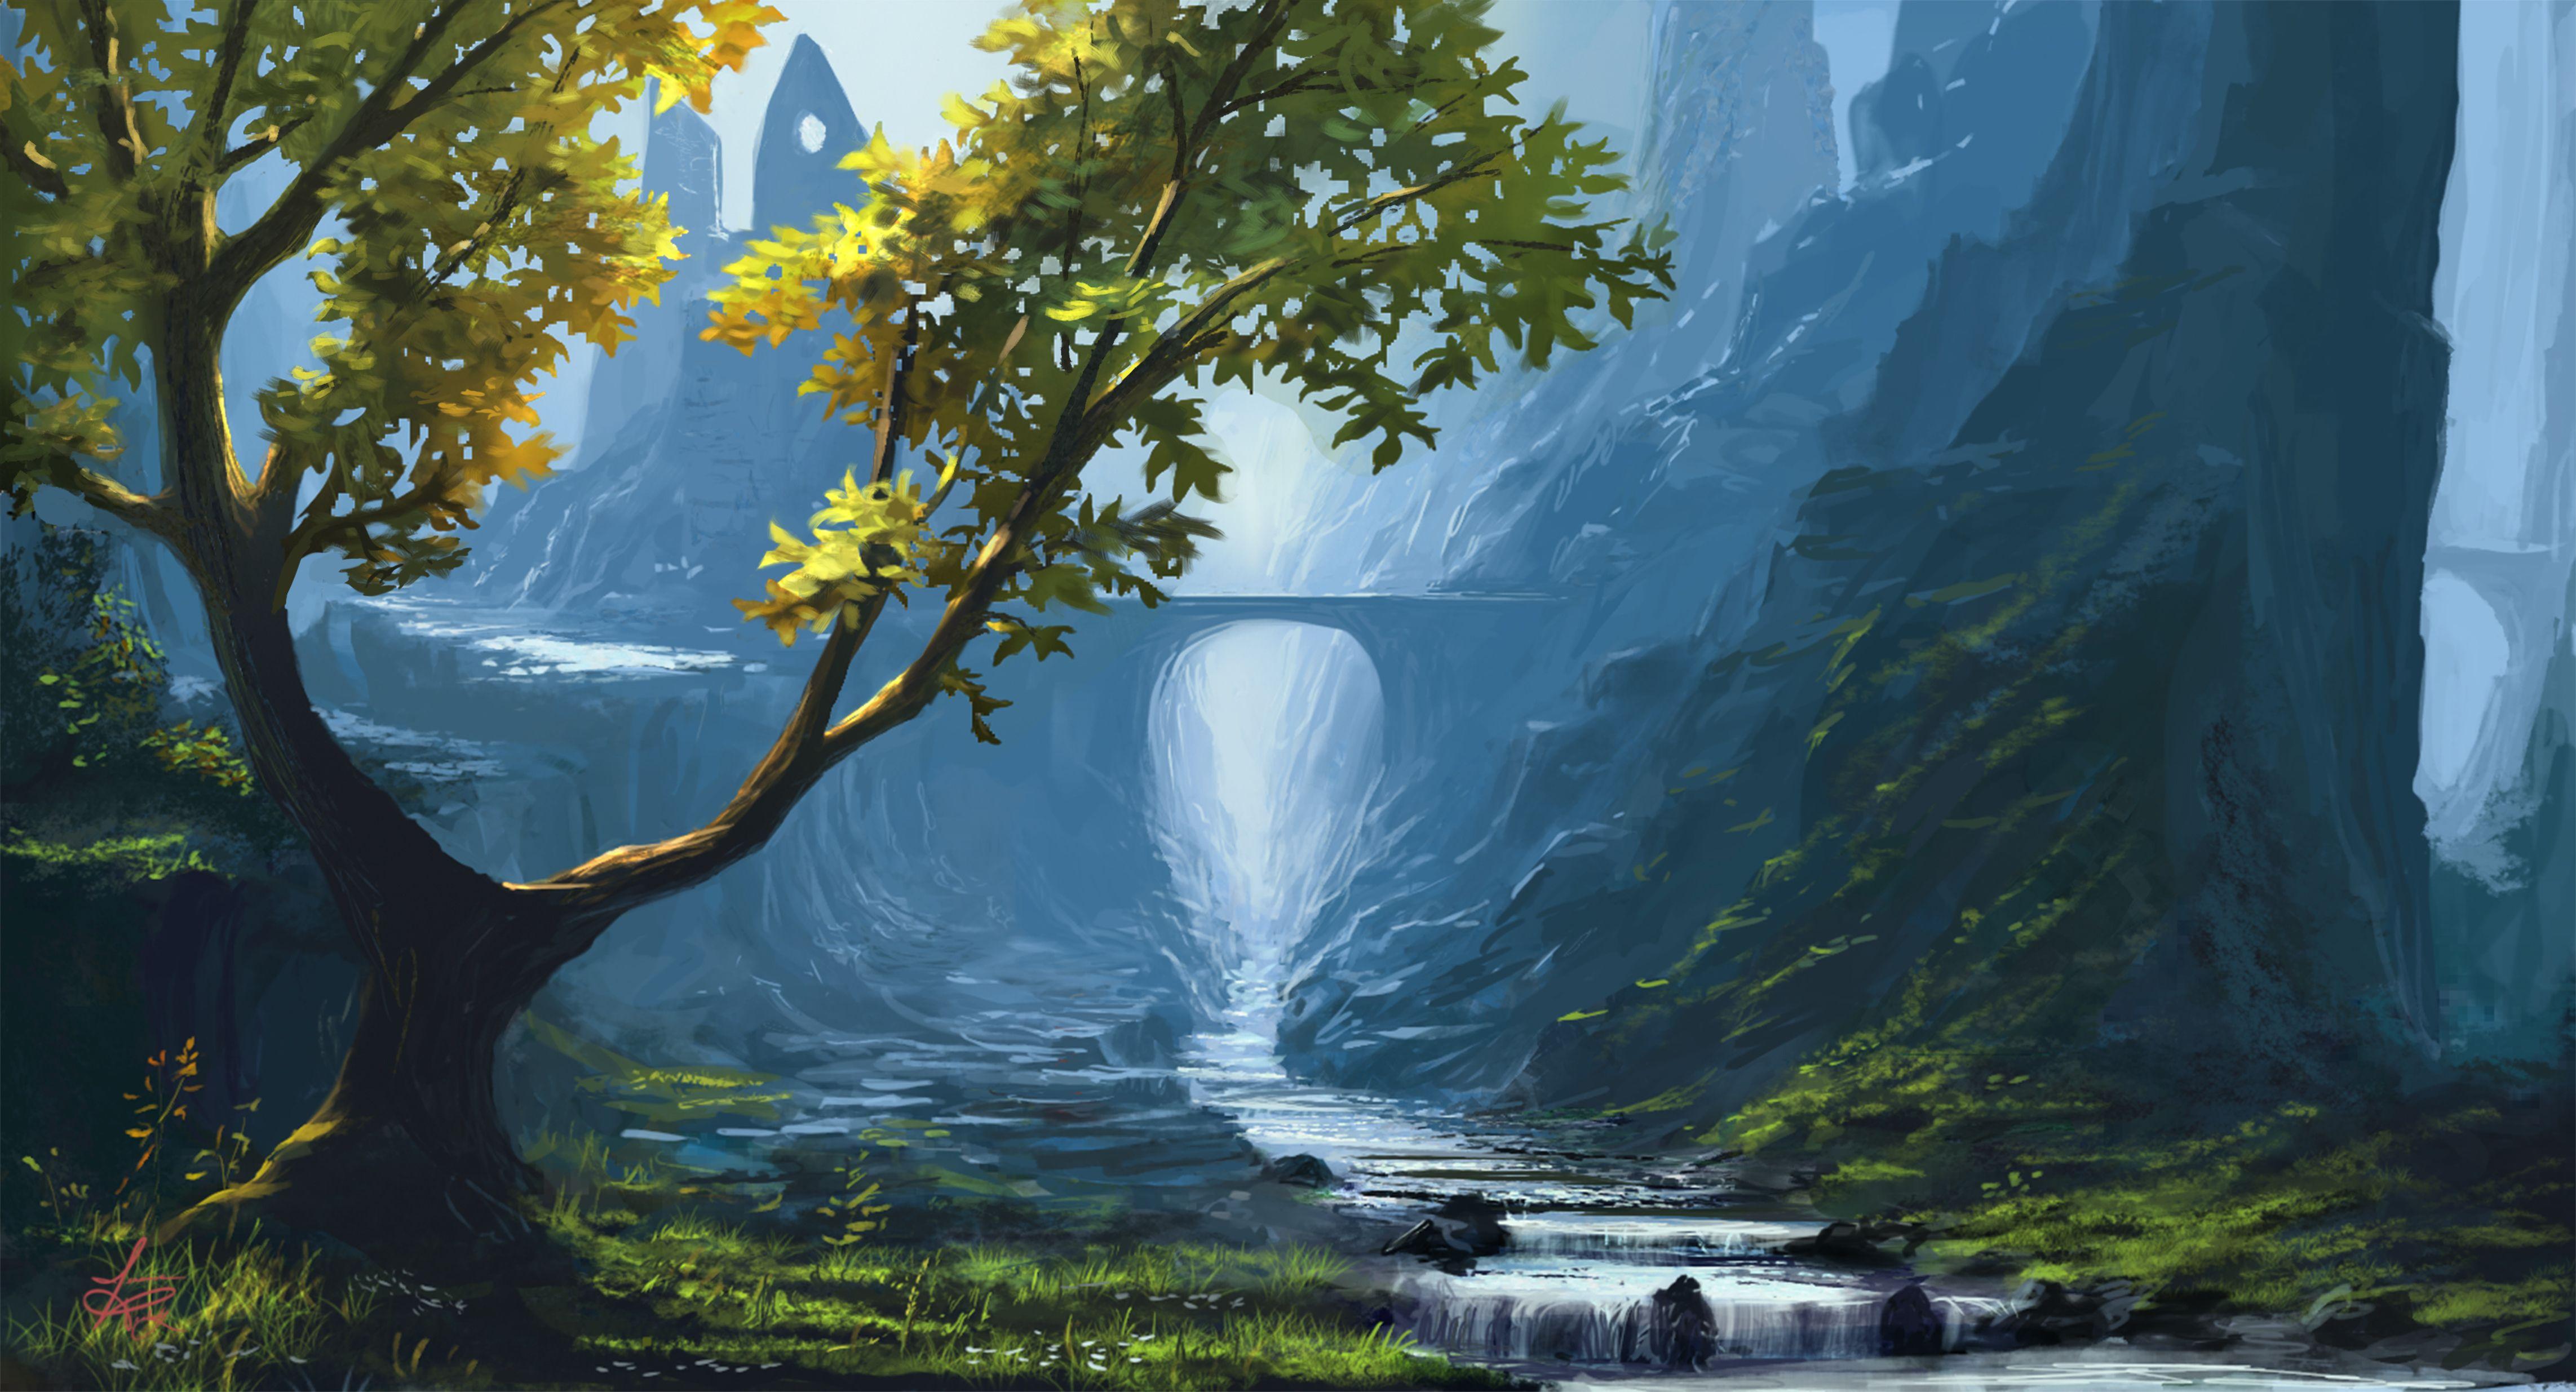 Paesaggio fantasy for Paesaggi fantasy immagini